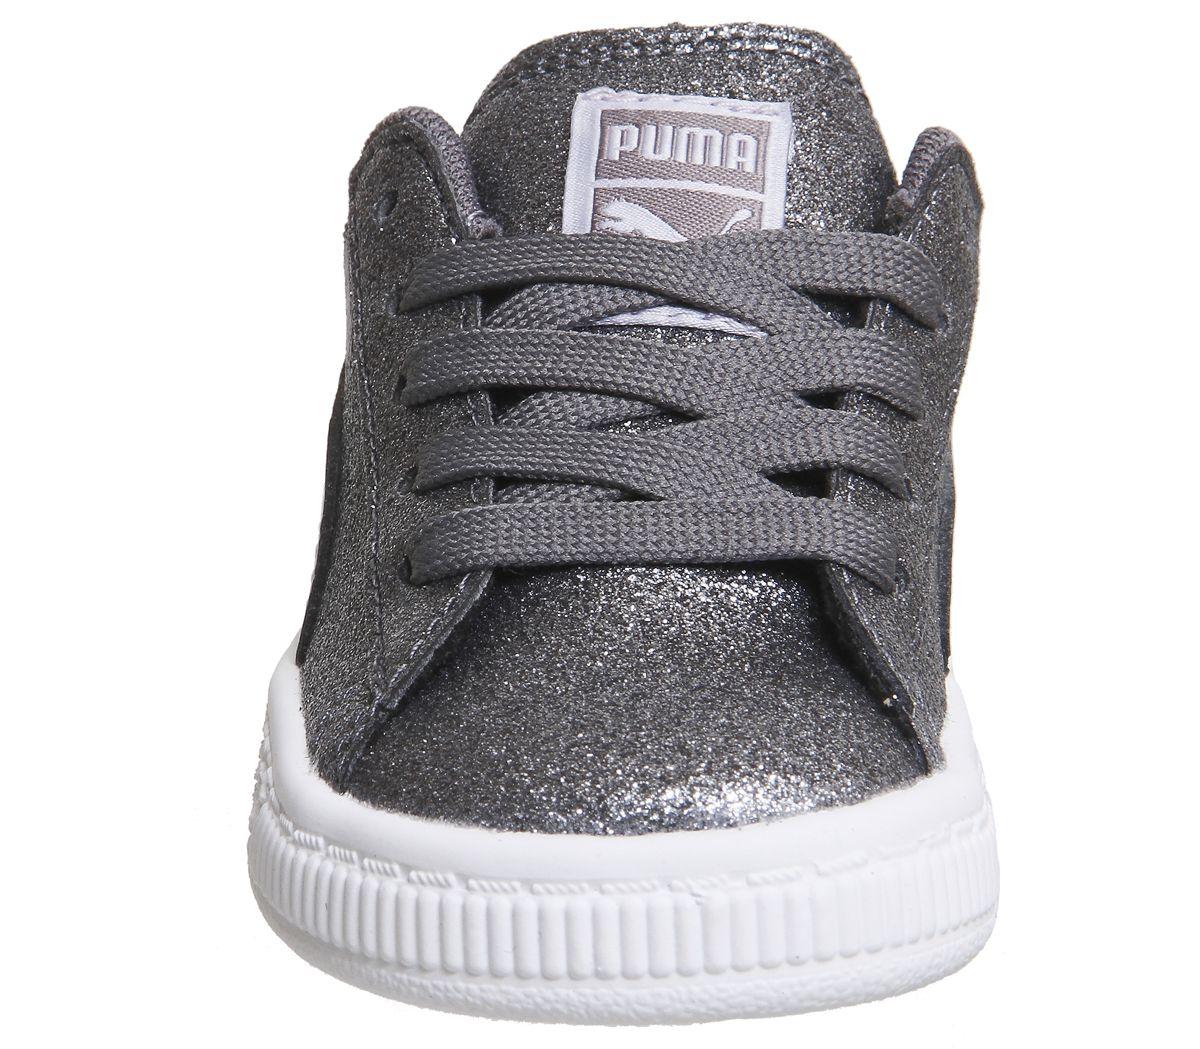 6106f22dcffc7 Kids-Puma-Basket-Infant-Silencieux-OMBRE-GLITTER-KIDS miniature